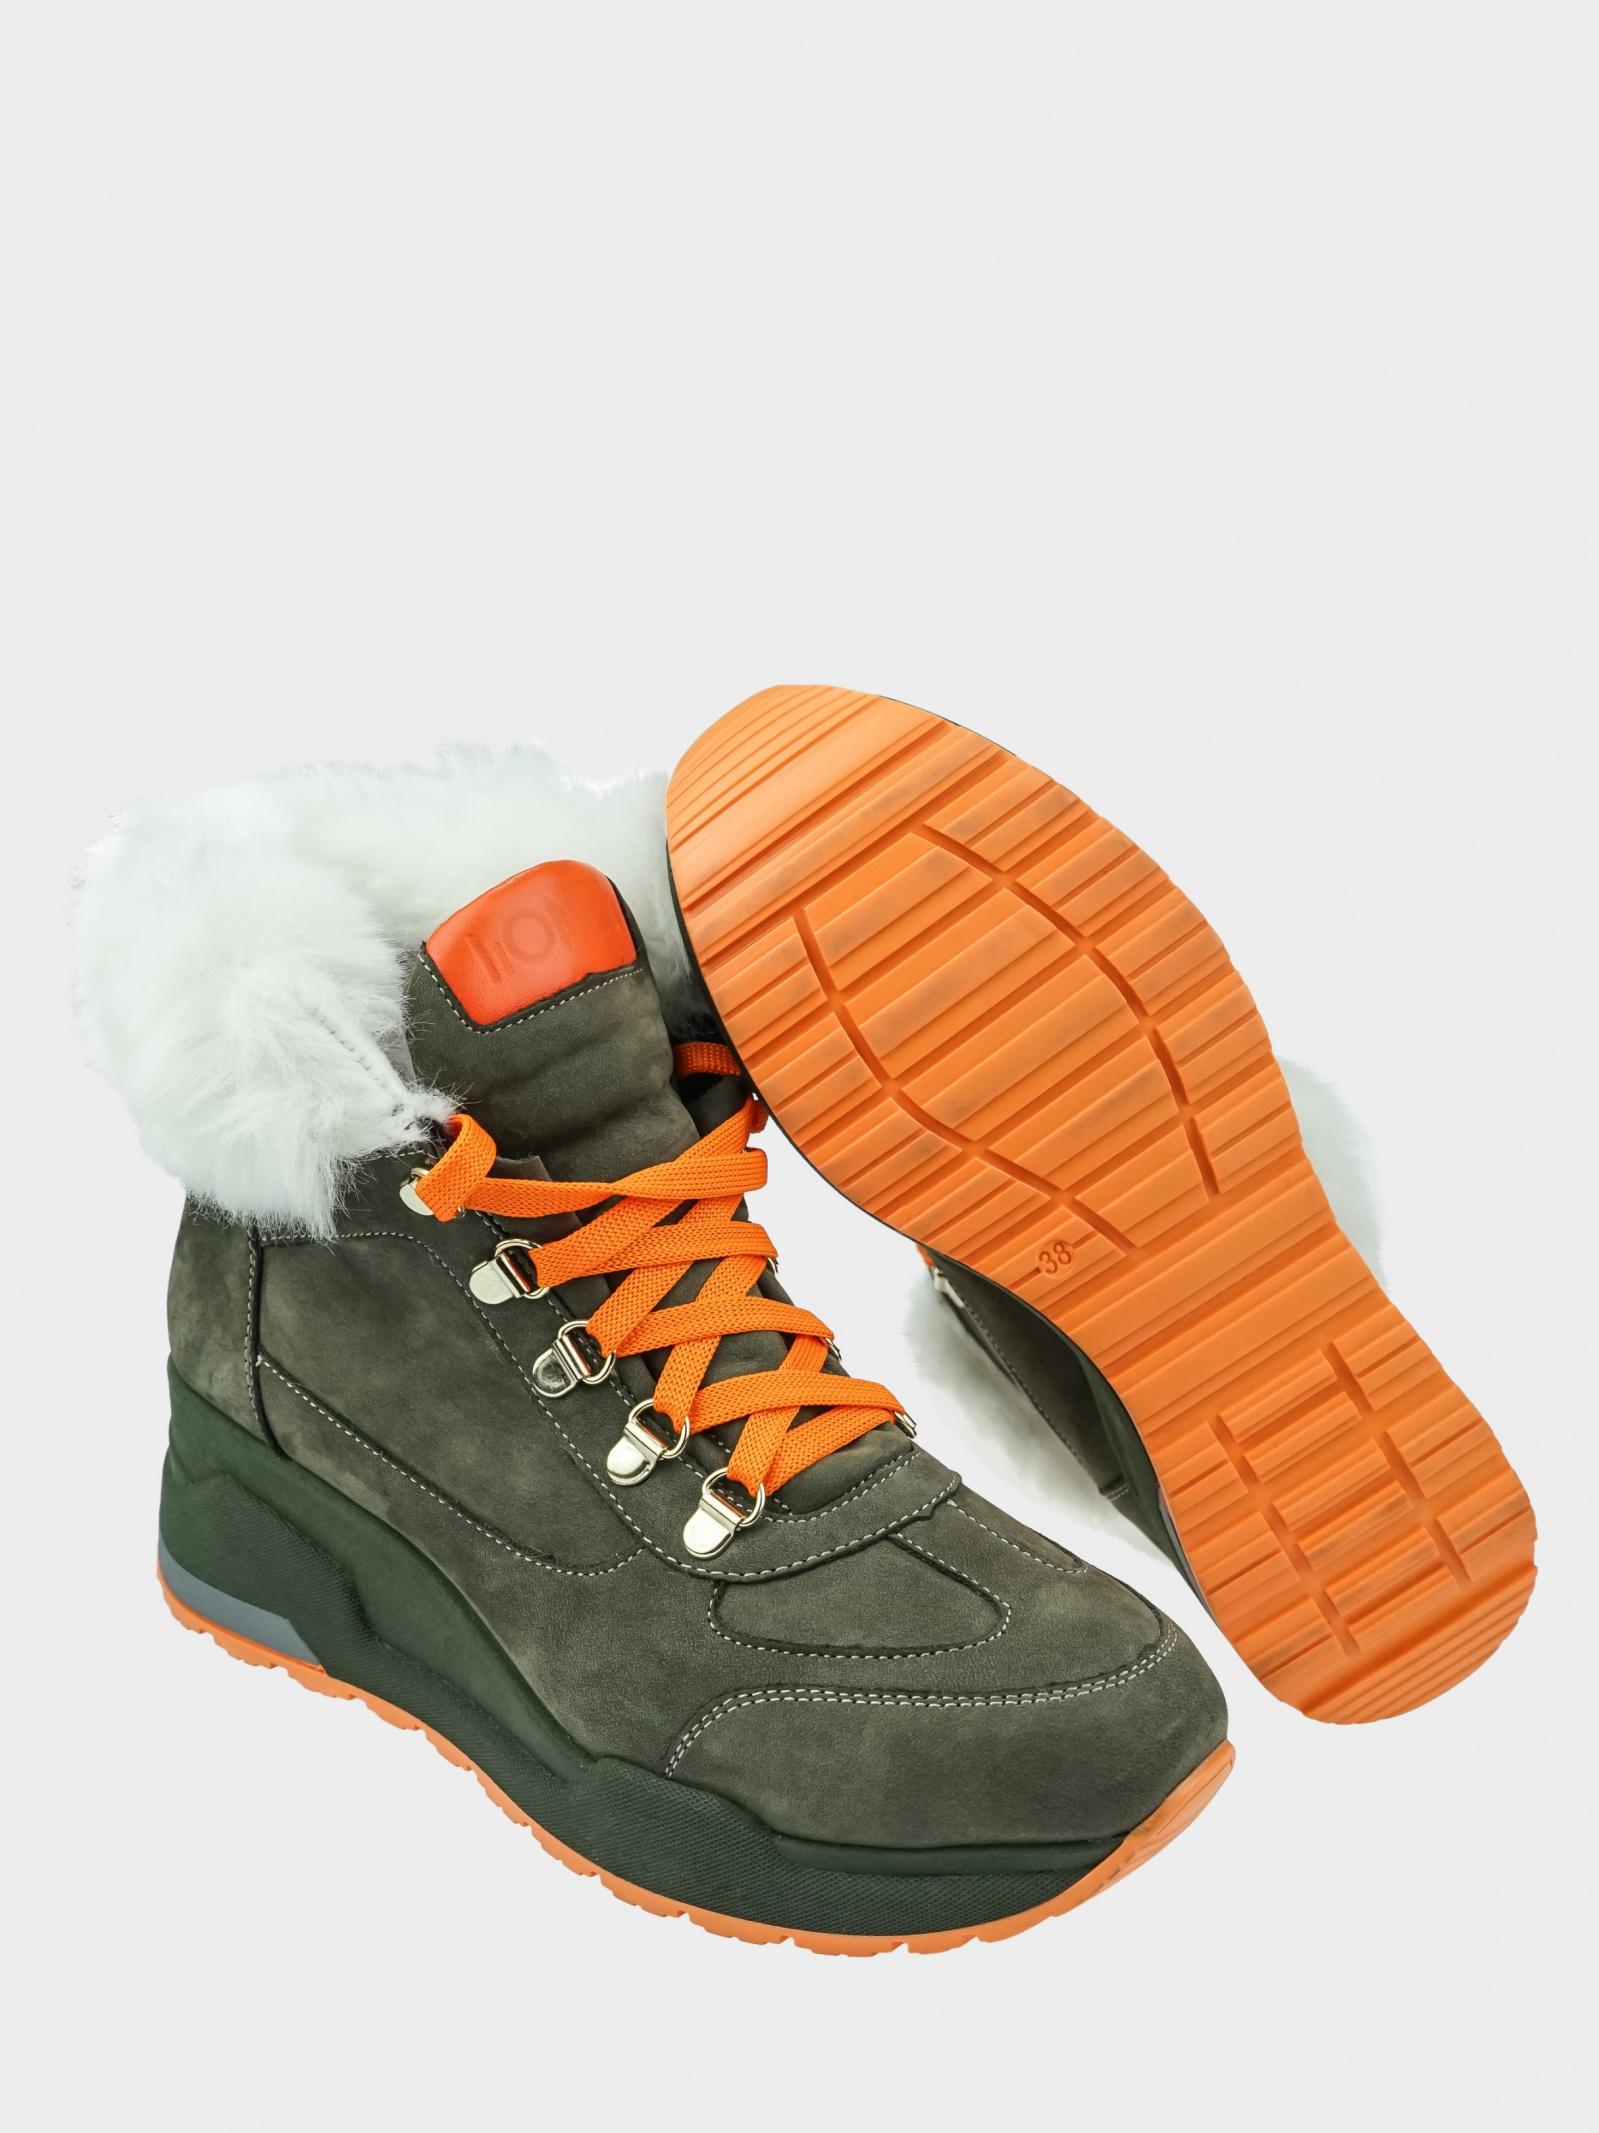 Ботинки женские Ботинки LZ6305-23 размеры обуви, 2017